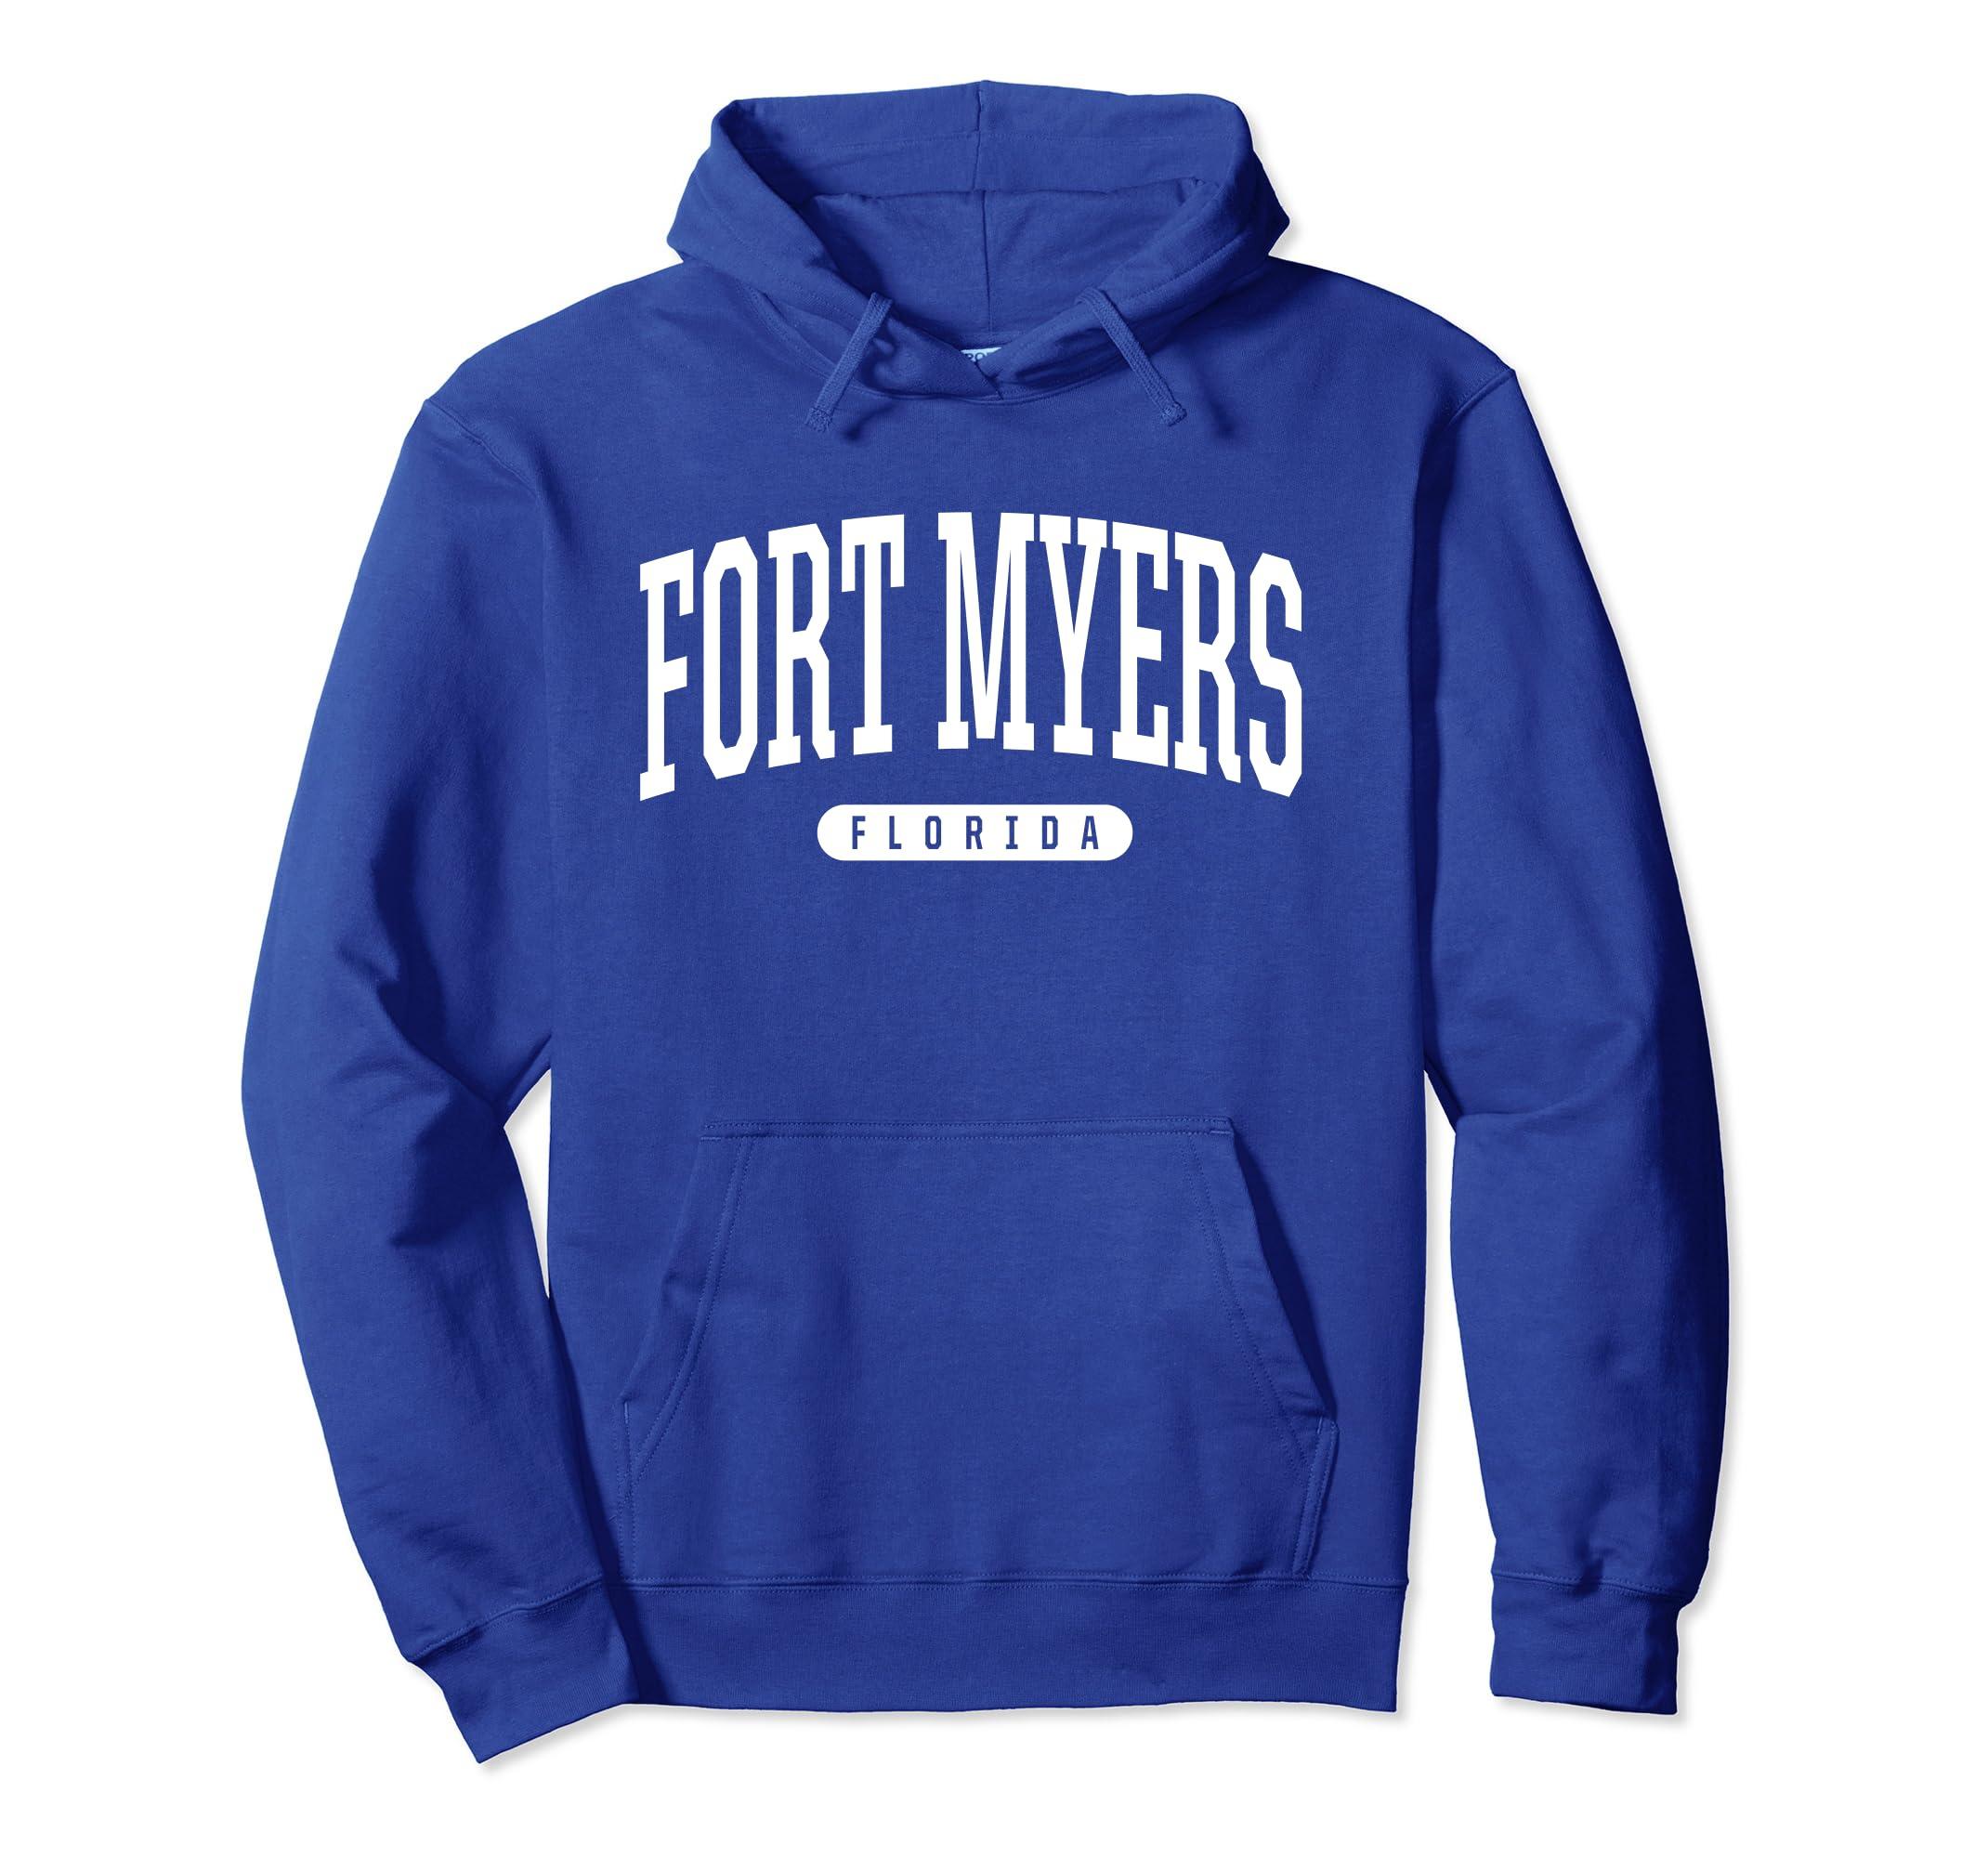 Fort Myers Hoodie Sweatshirt College University Style FL USA-Rose